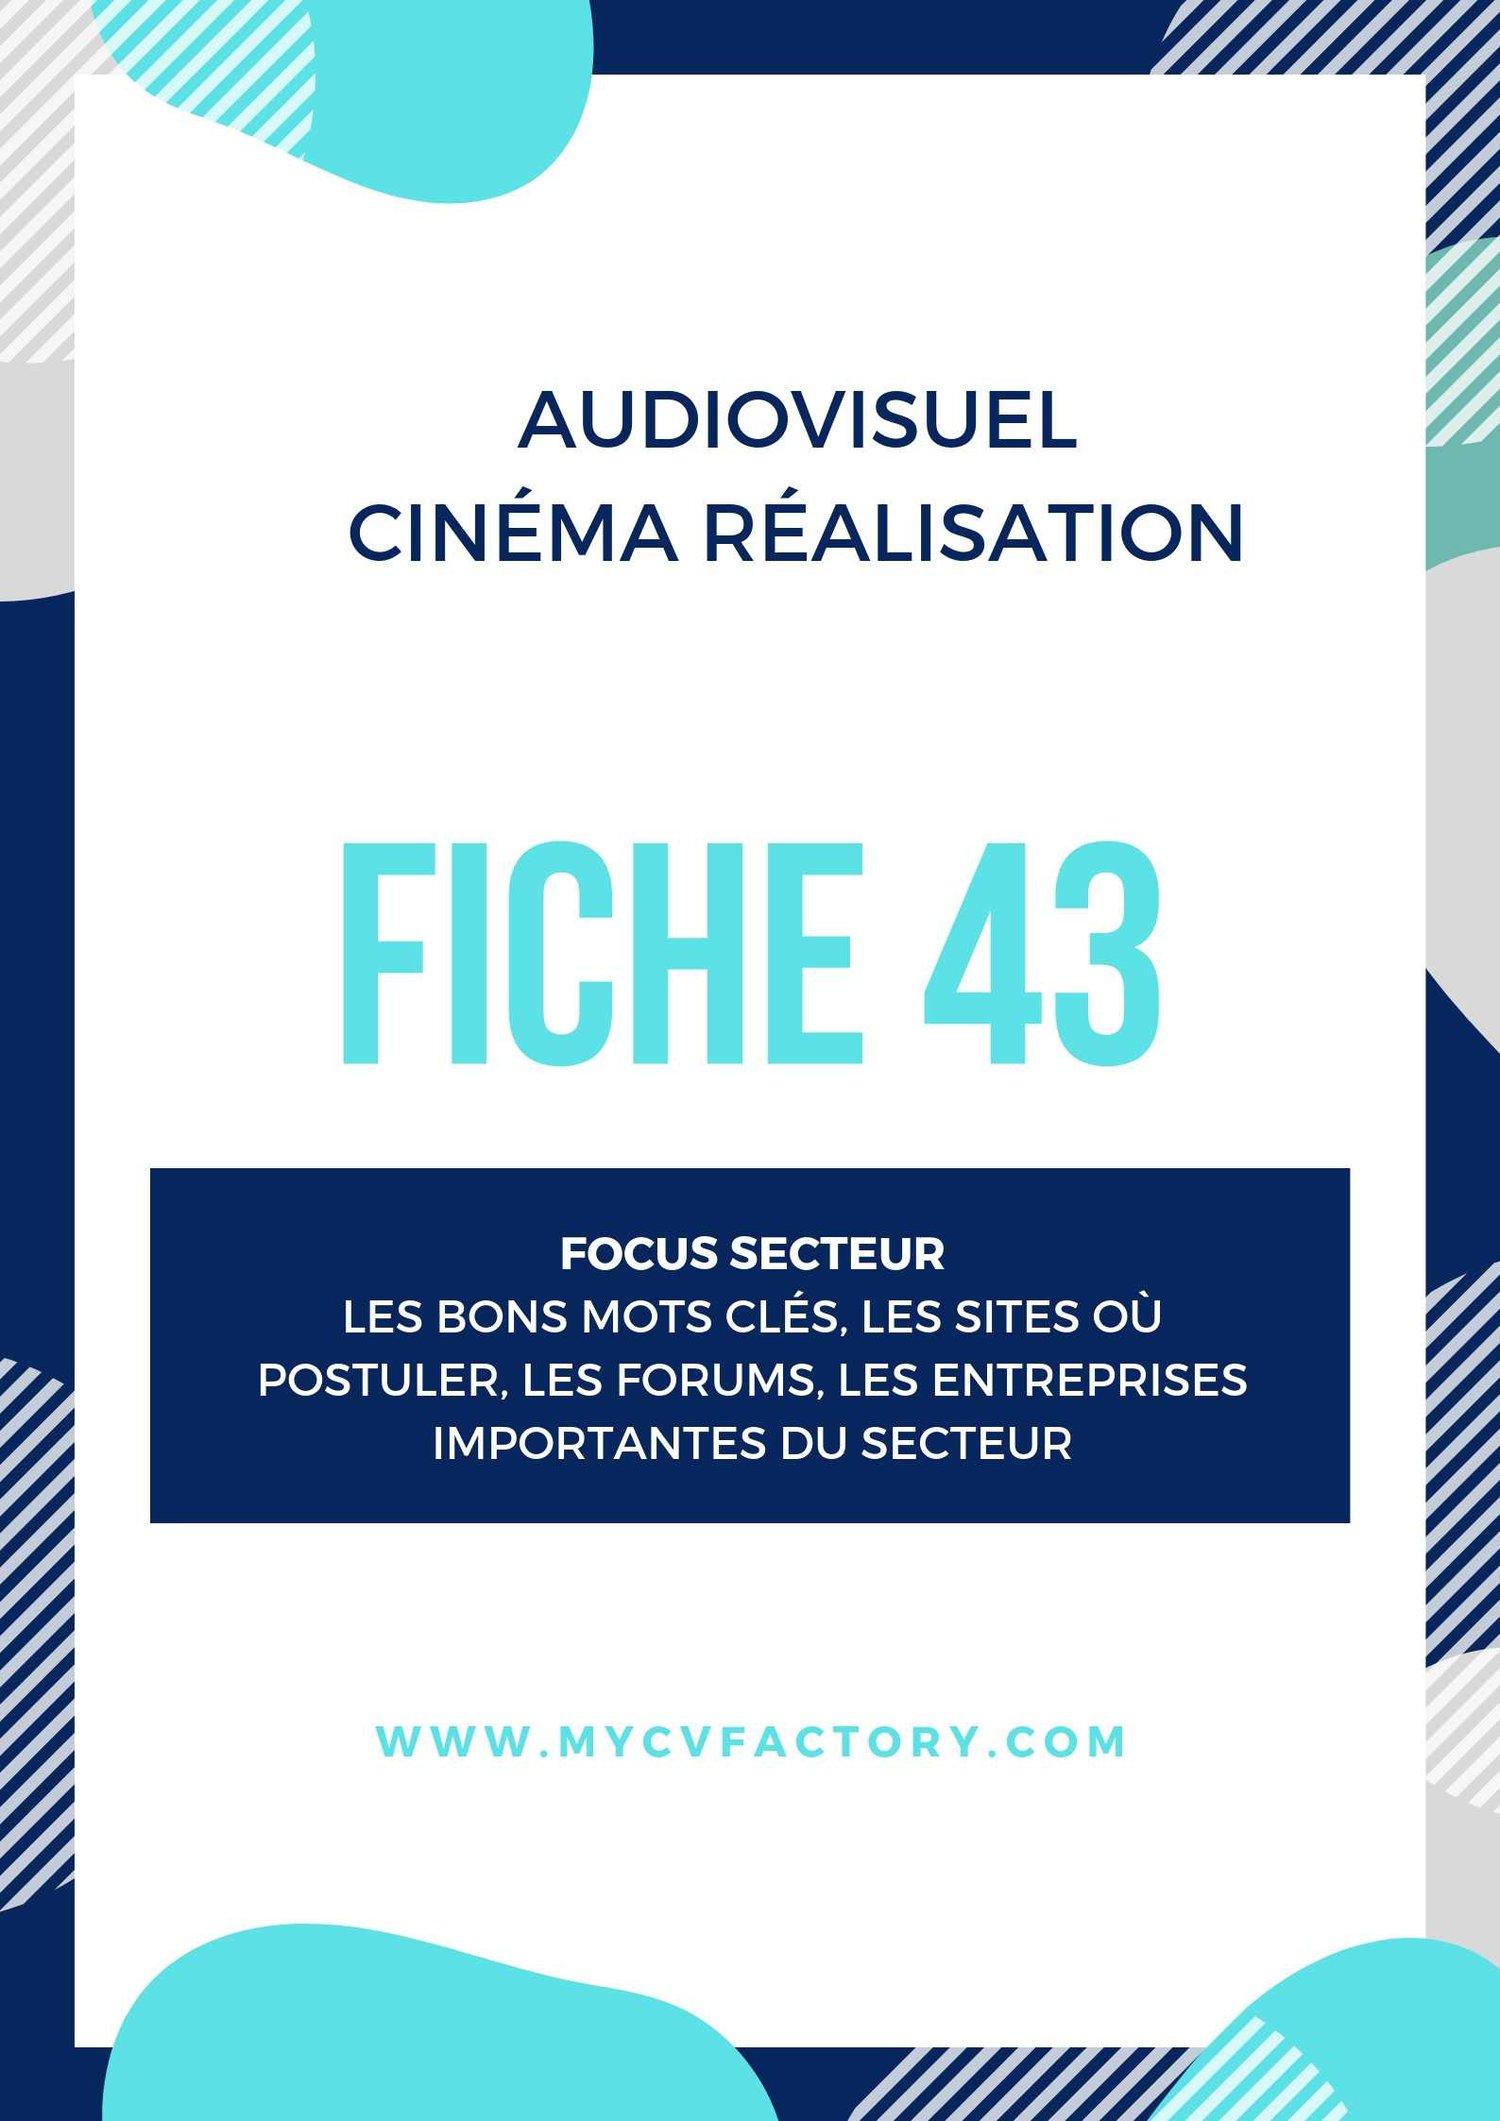 43 AUDI cinéma realisation.jpg